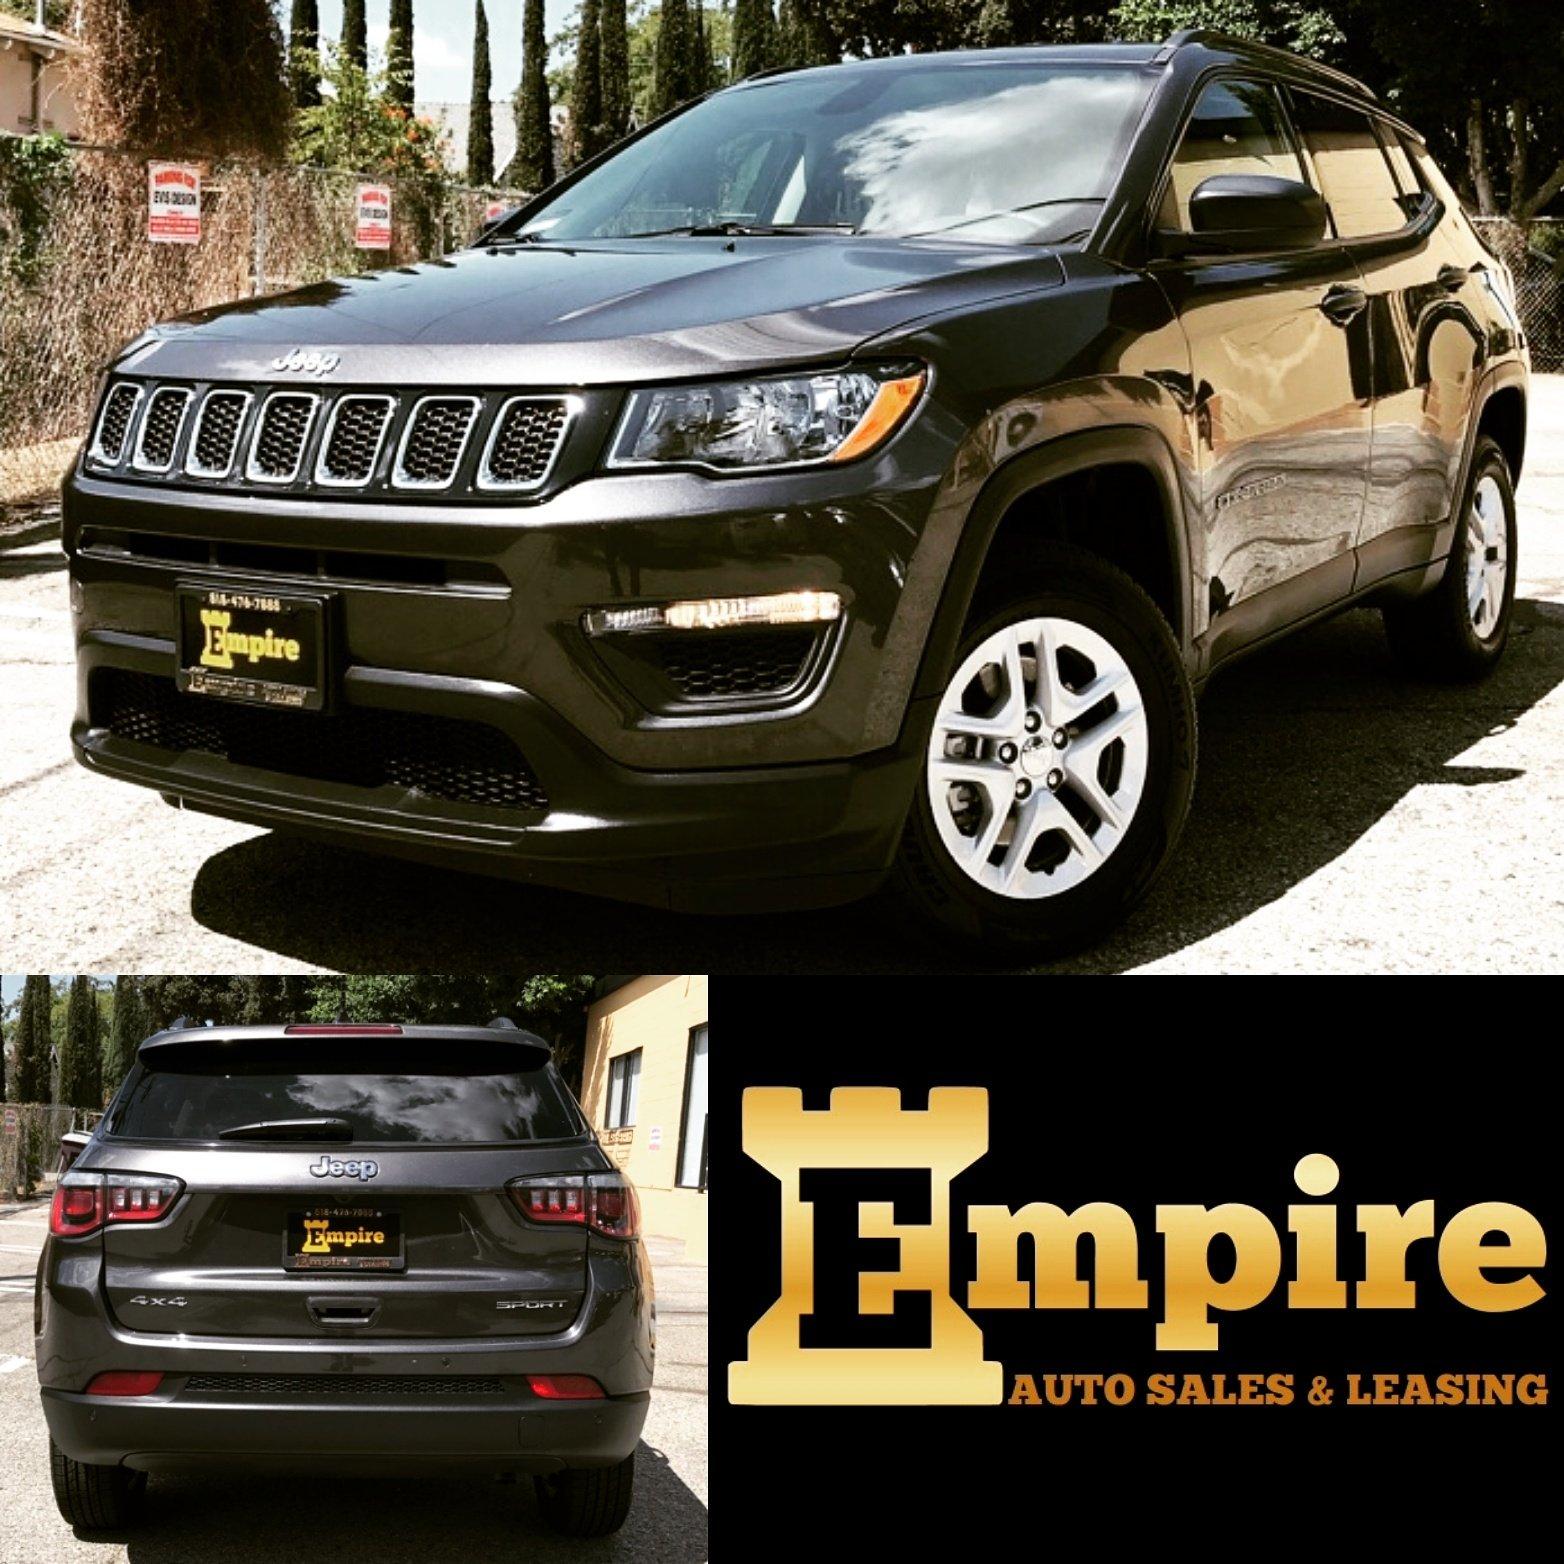 Empire Auto Sales >> Empire Auto Sales On Twitter Congratulations Ronnie On